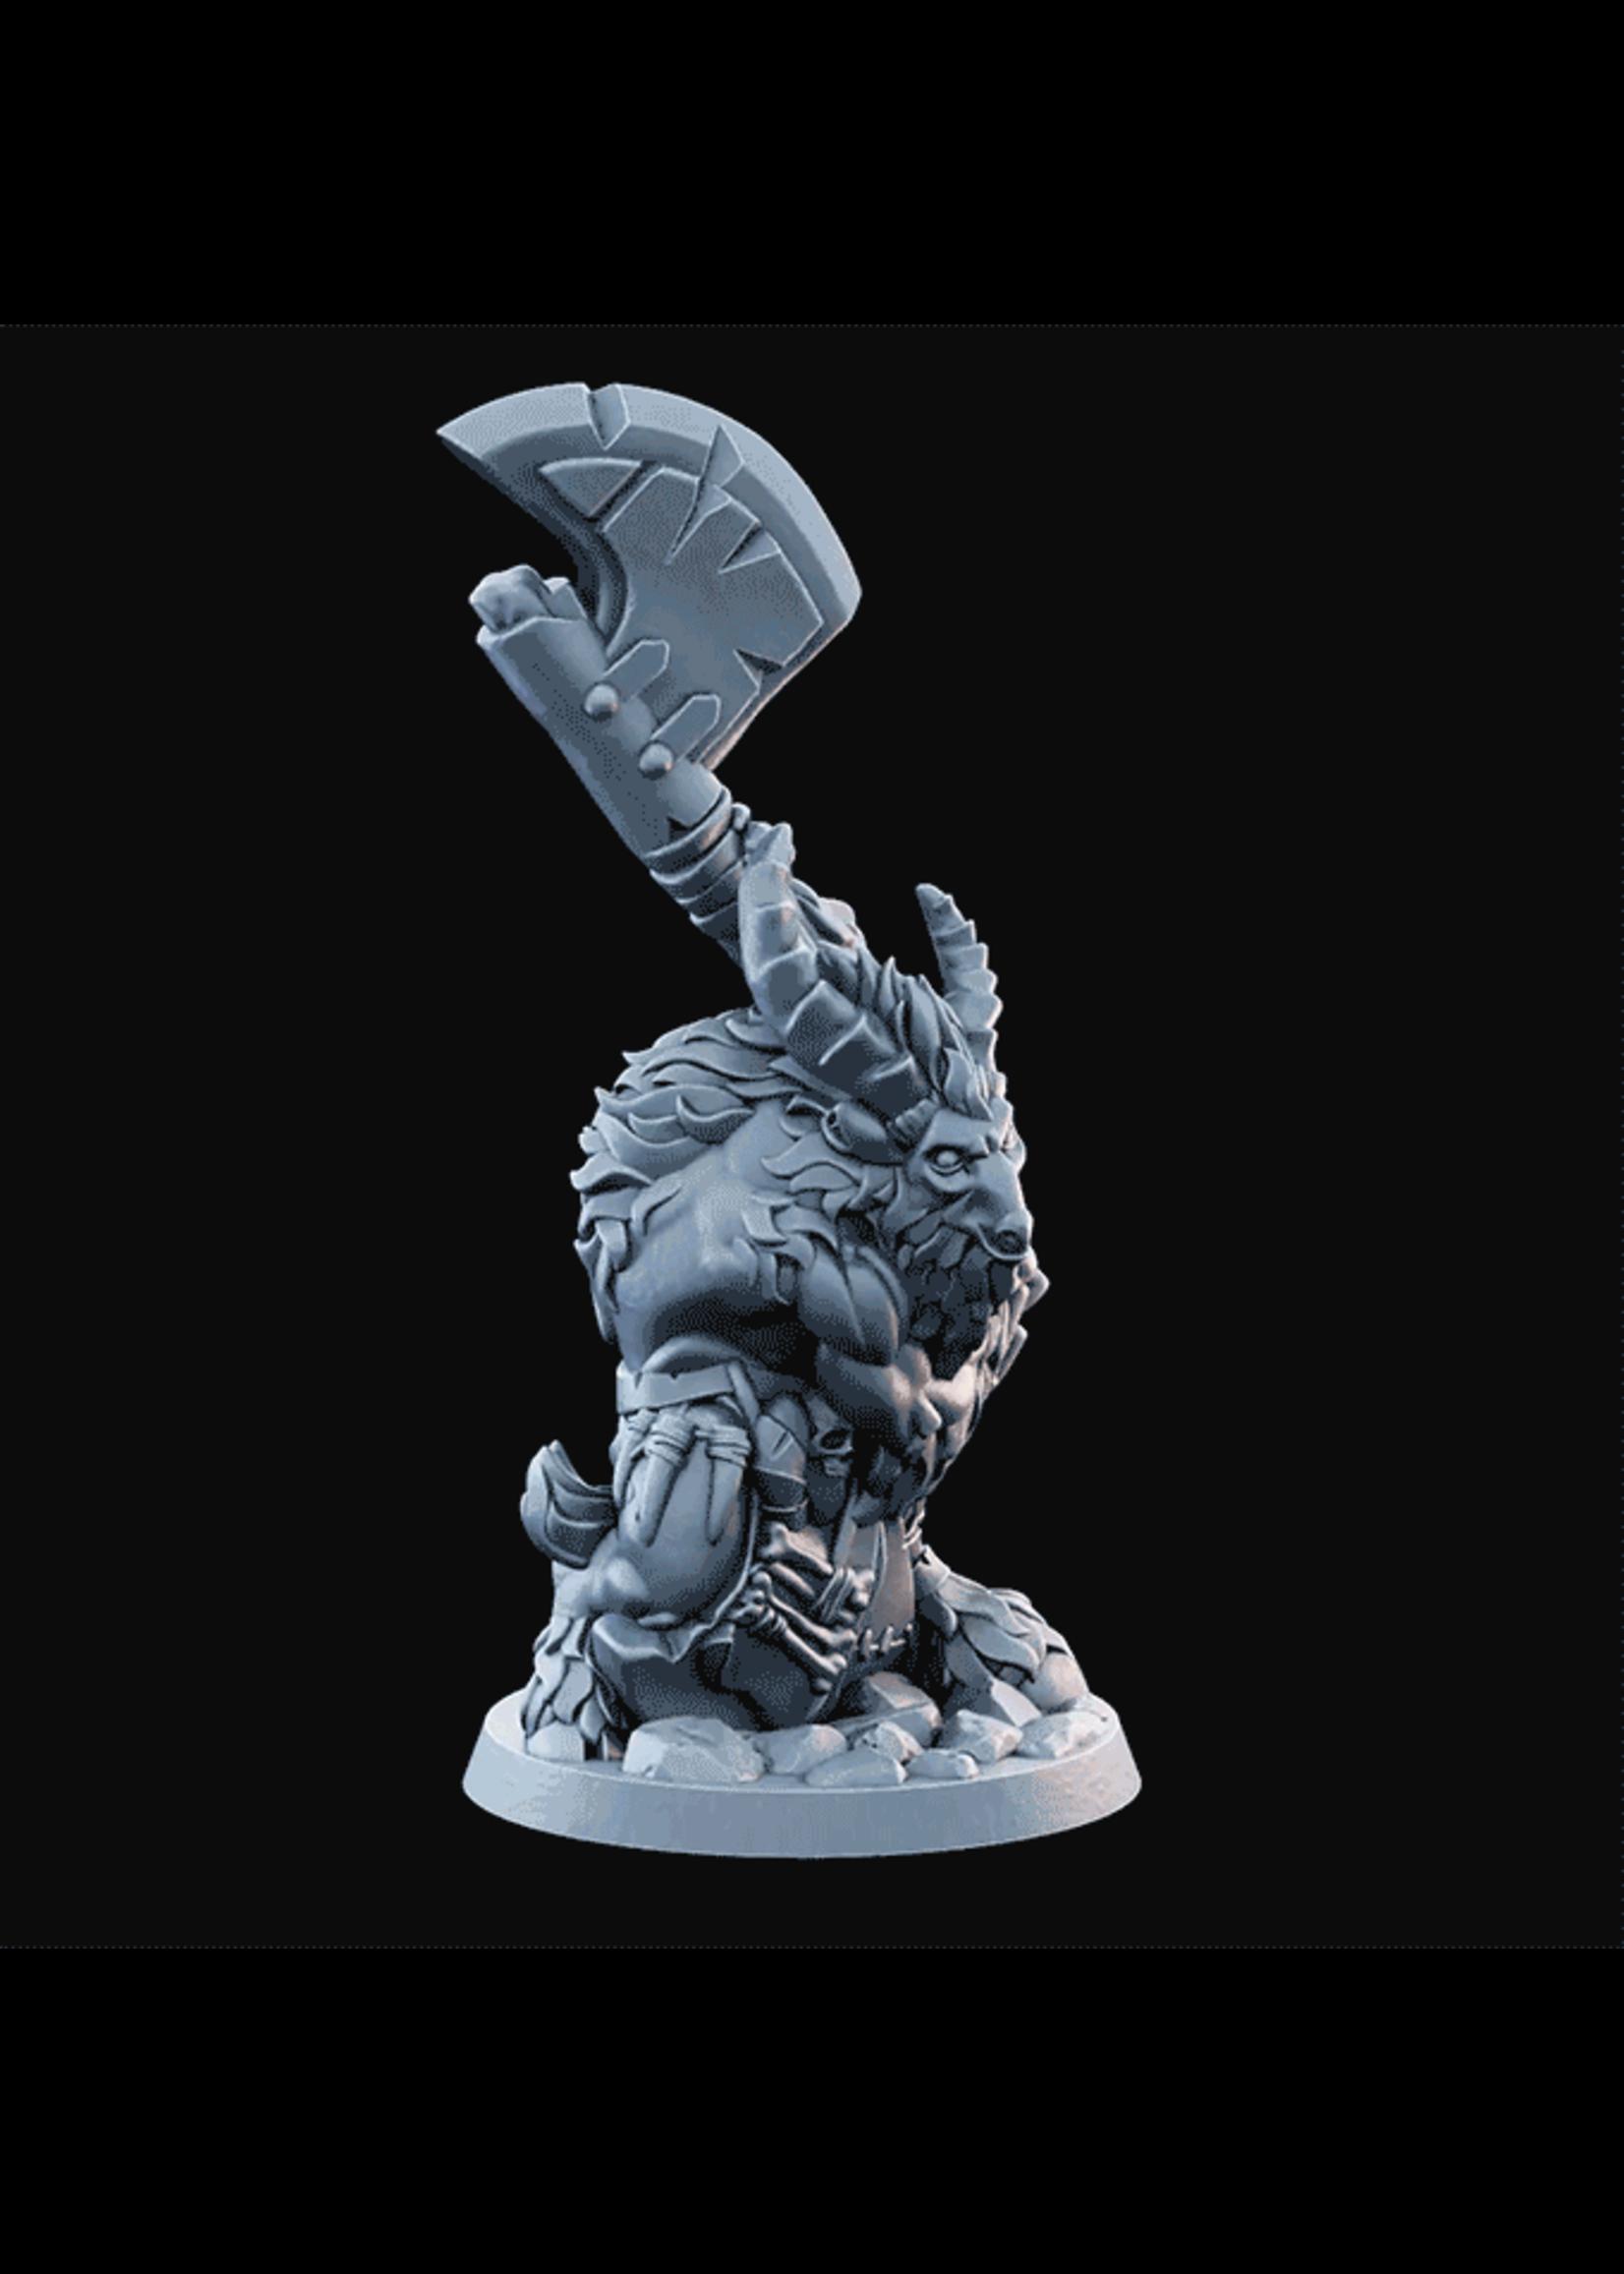 3D Printed Miniature - Goatman02  - Dungeons & Dragons - Desolate Plains KS